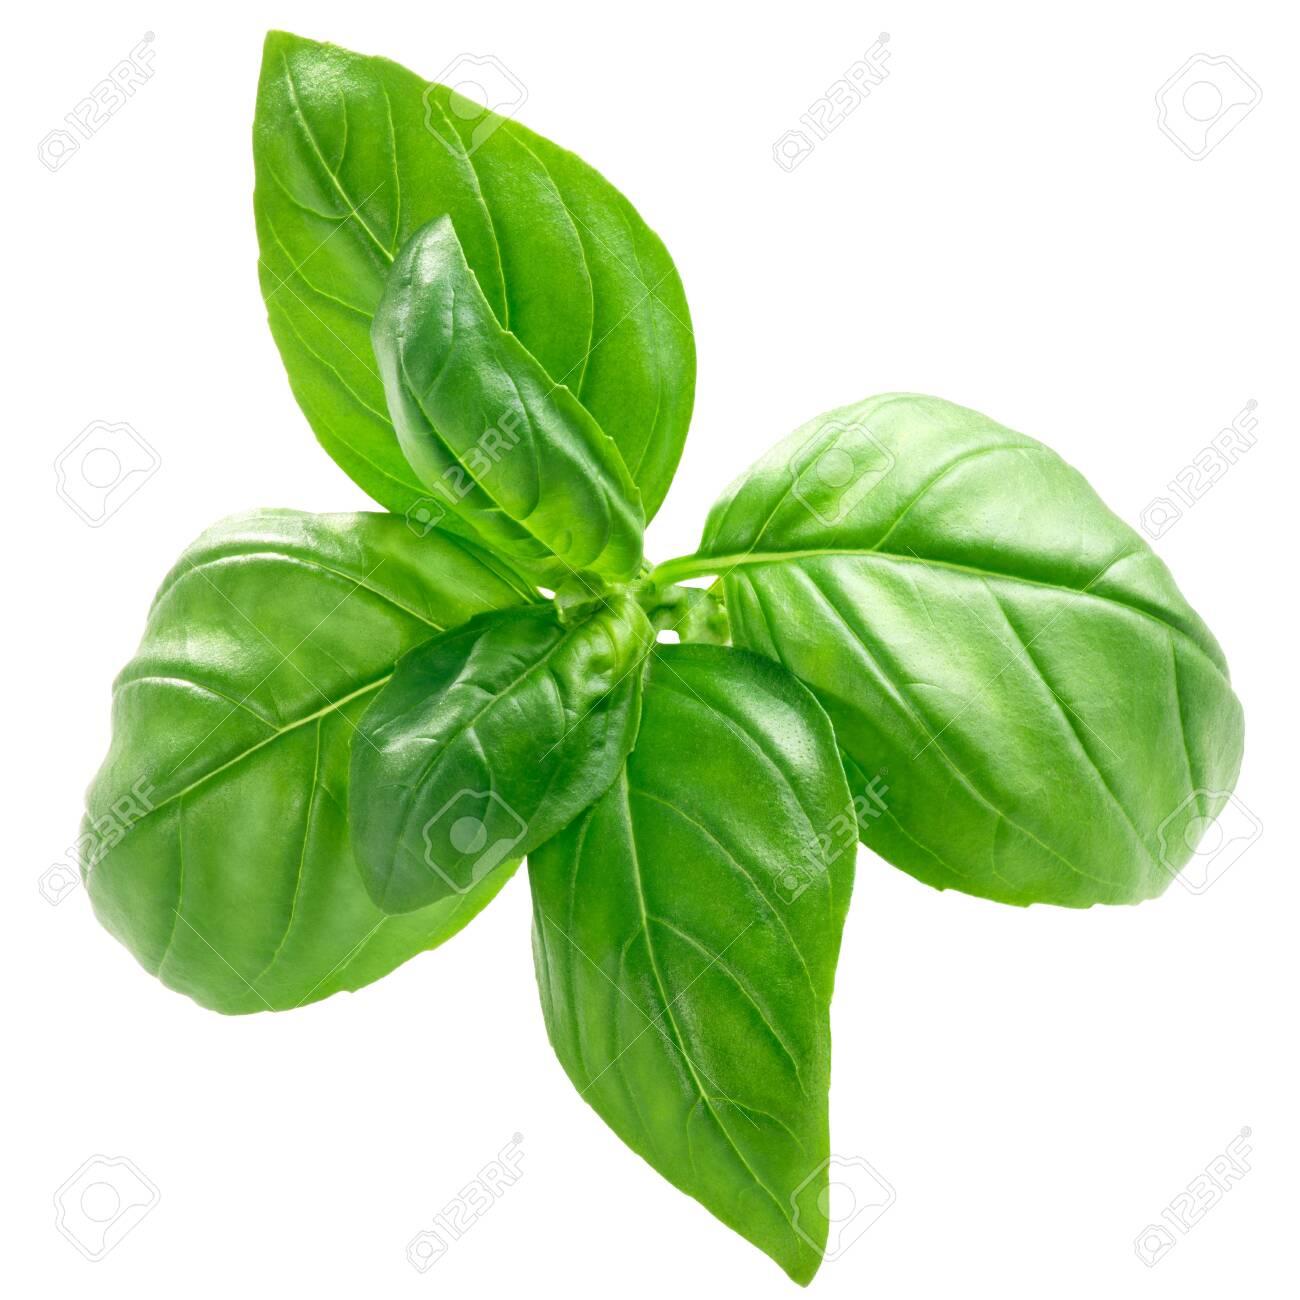 Basil leaves (Ocimum basilicum), bulgy, isolated, top view - 130407470